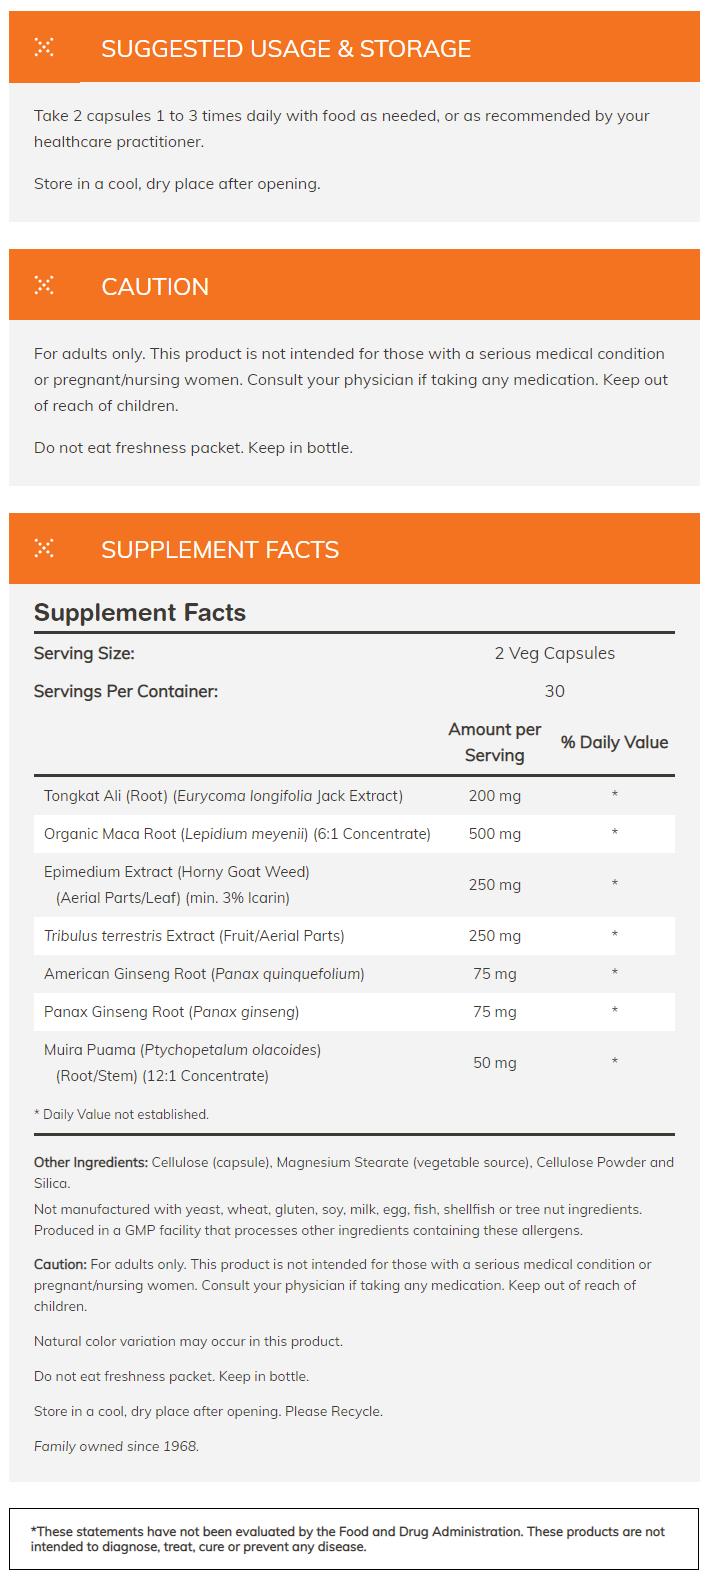 screenshot-www.nowfoods.com-2020.07.15-15_36_35.png